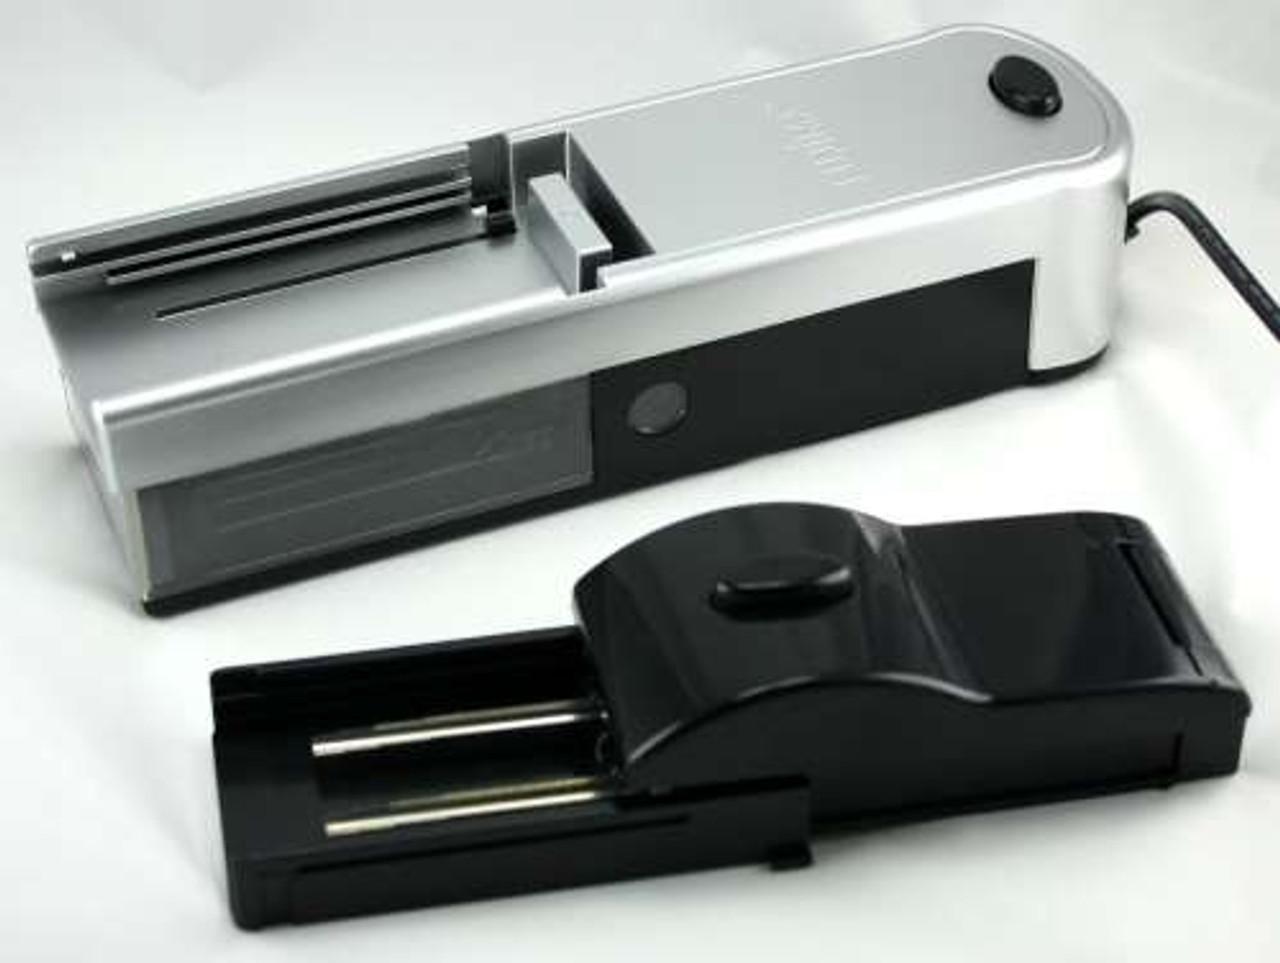 E2 Matic Electric Cigarette Rolling Machine